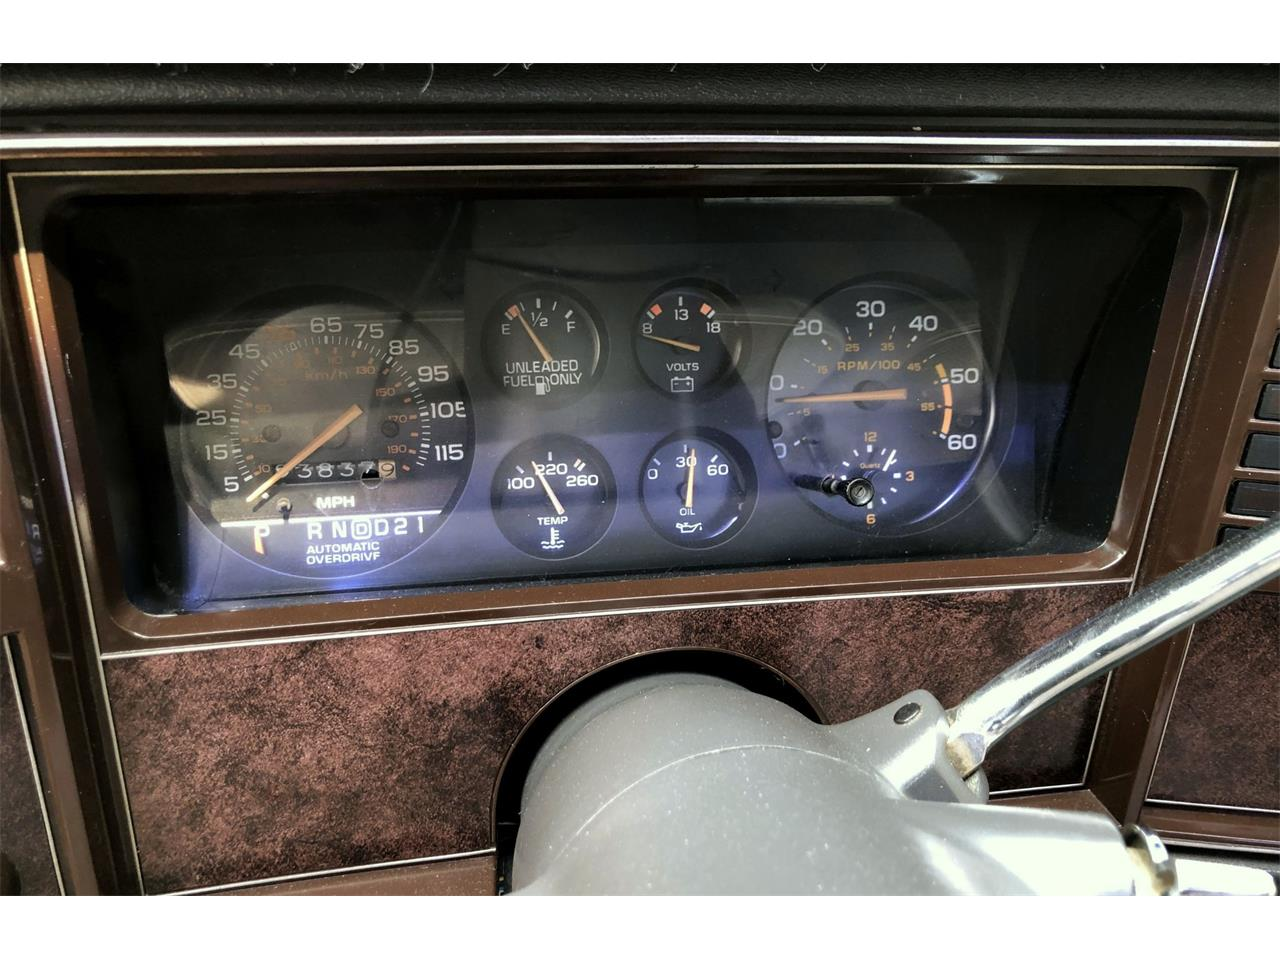 1983 Chevrolet El Camino (CC-1231382) for sale in Maple Lake, Minnesota